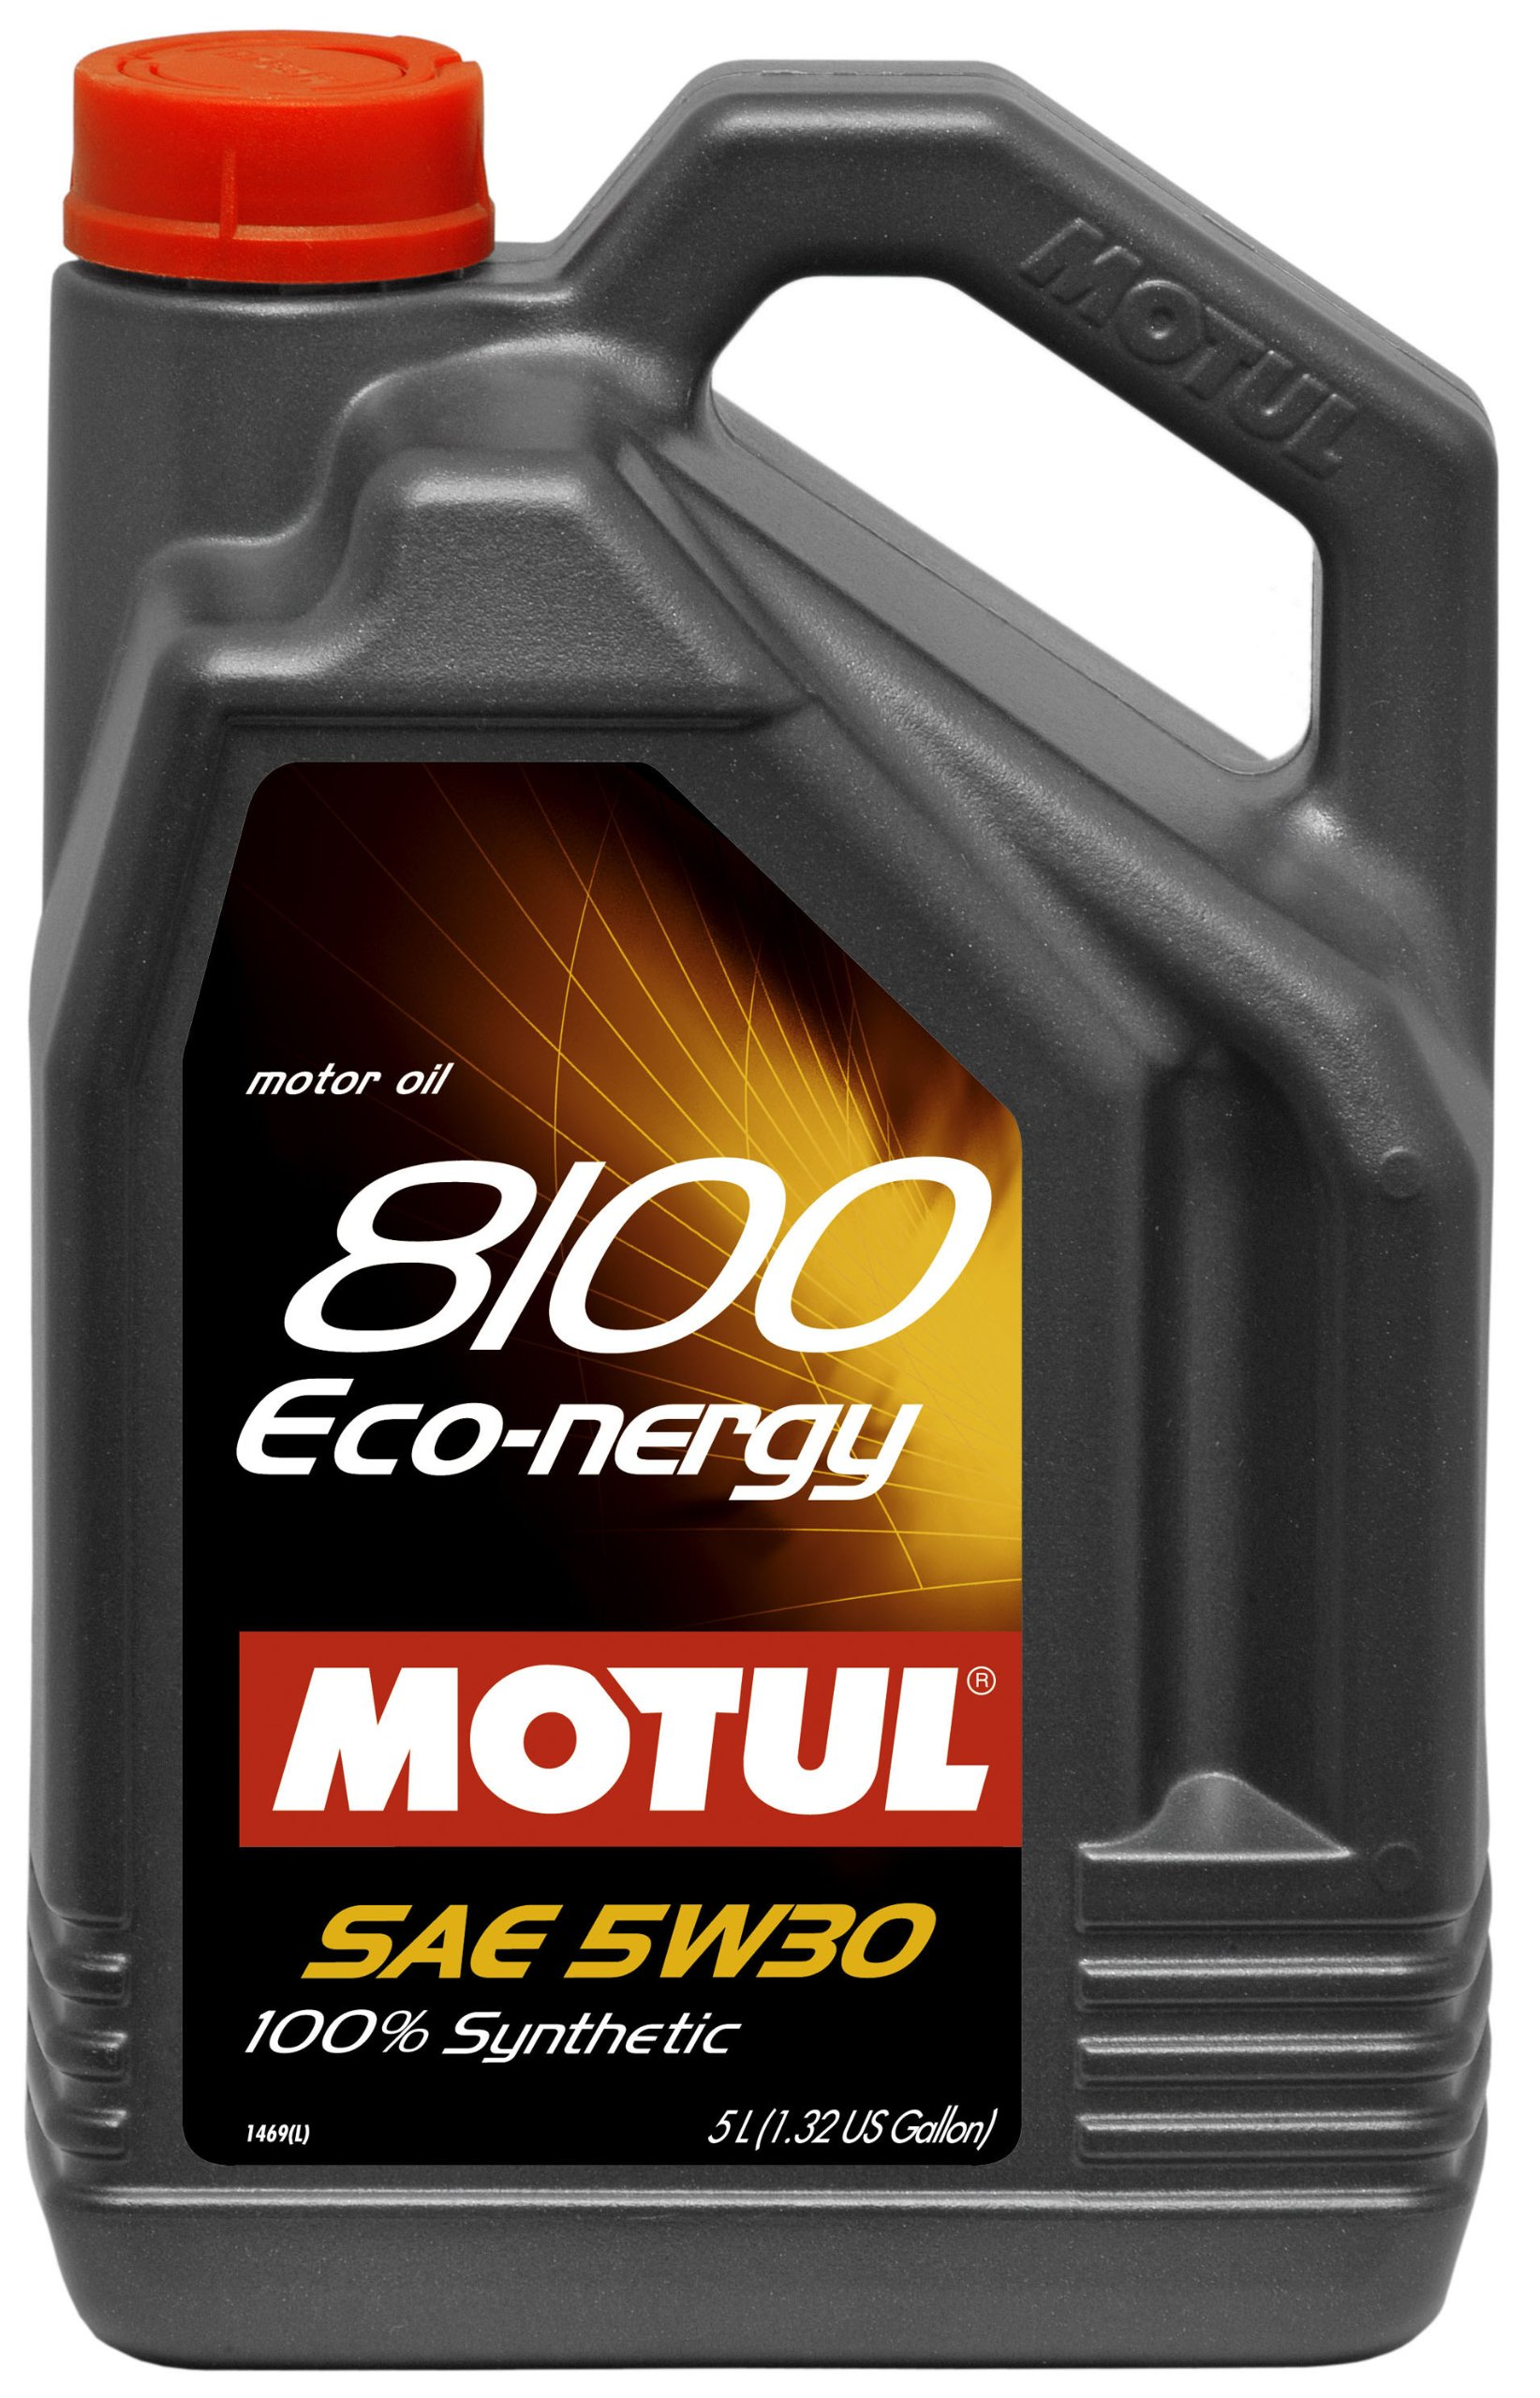 Motul 007229 8100 Eco nergy 5W30 100% Synthetic Engine Oil 5Liter 2 PK by Motul